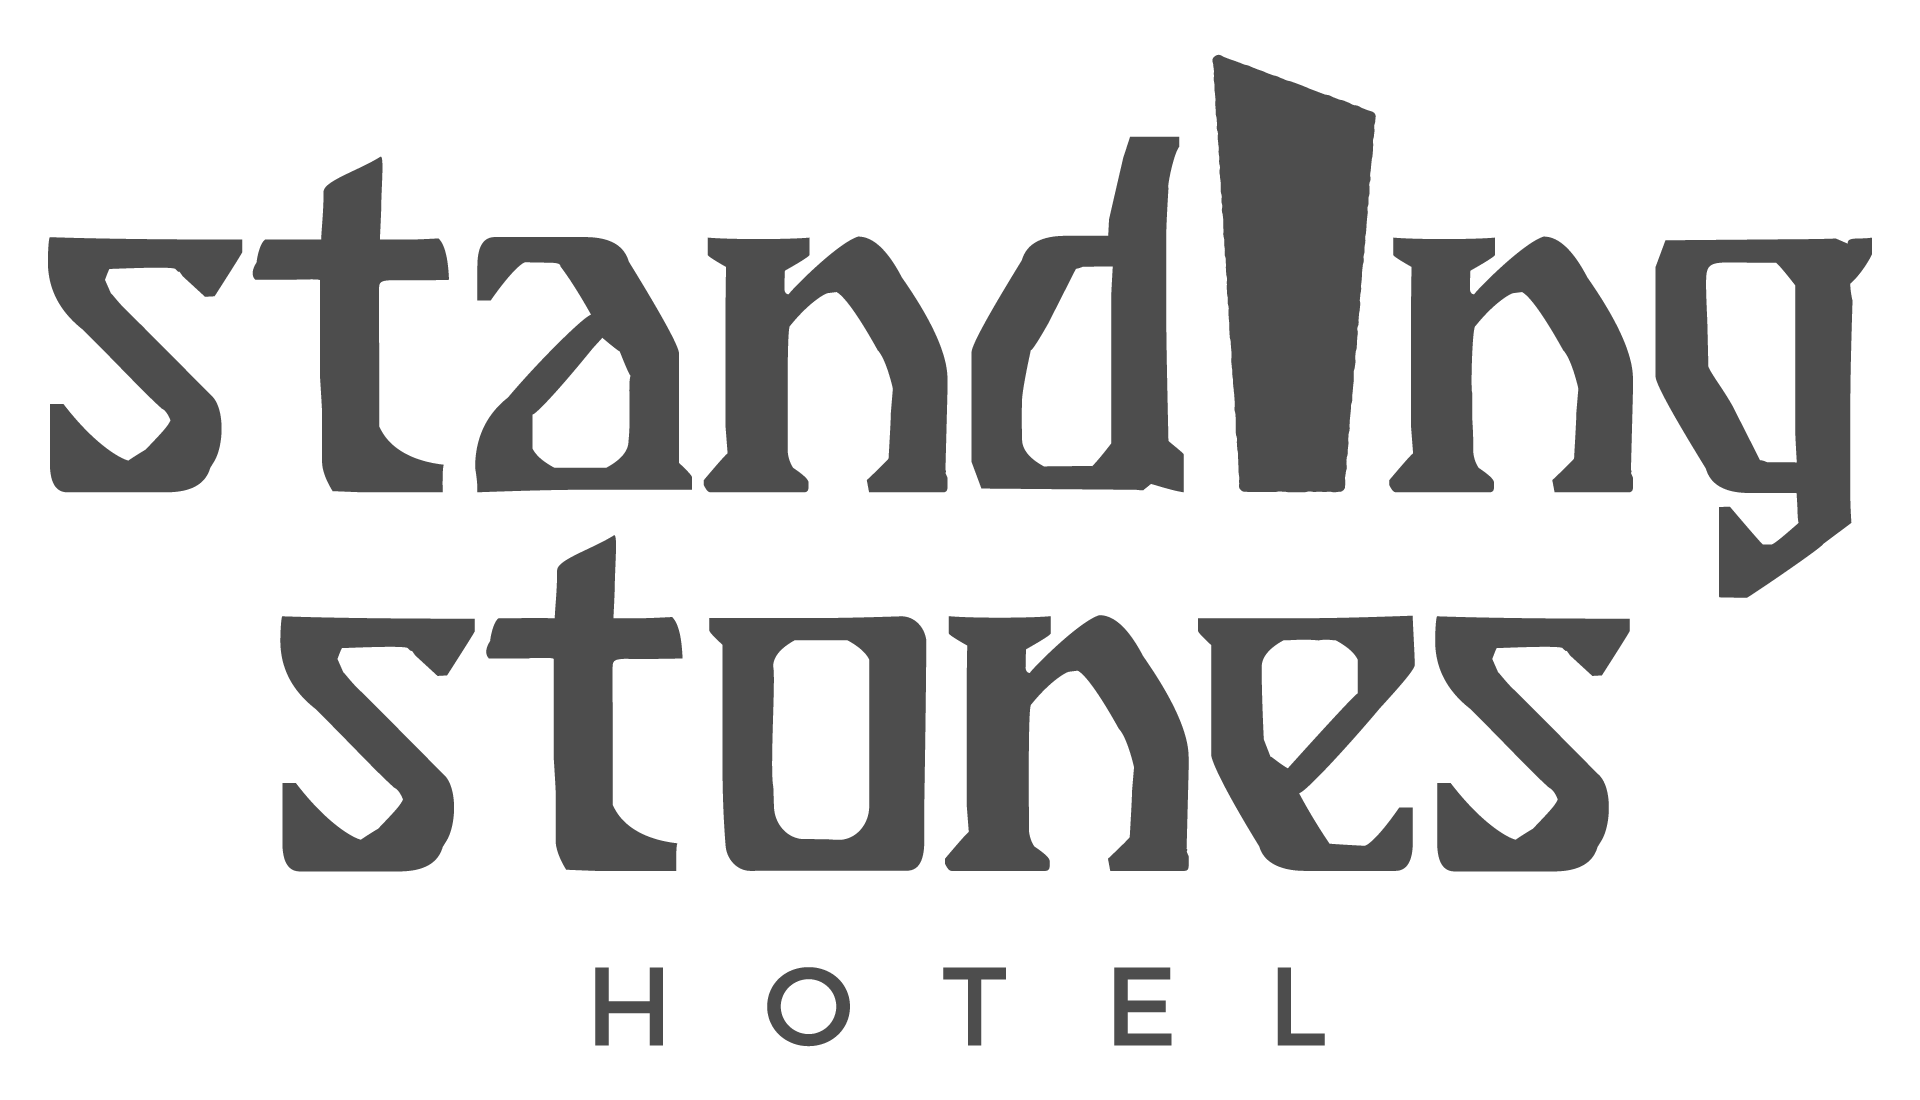 Logo of Standing Stones Hotel